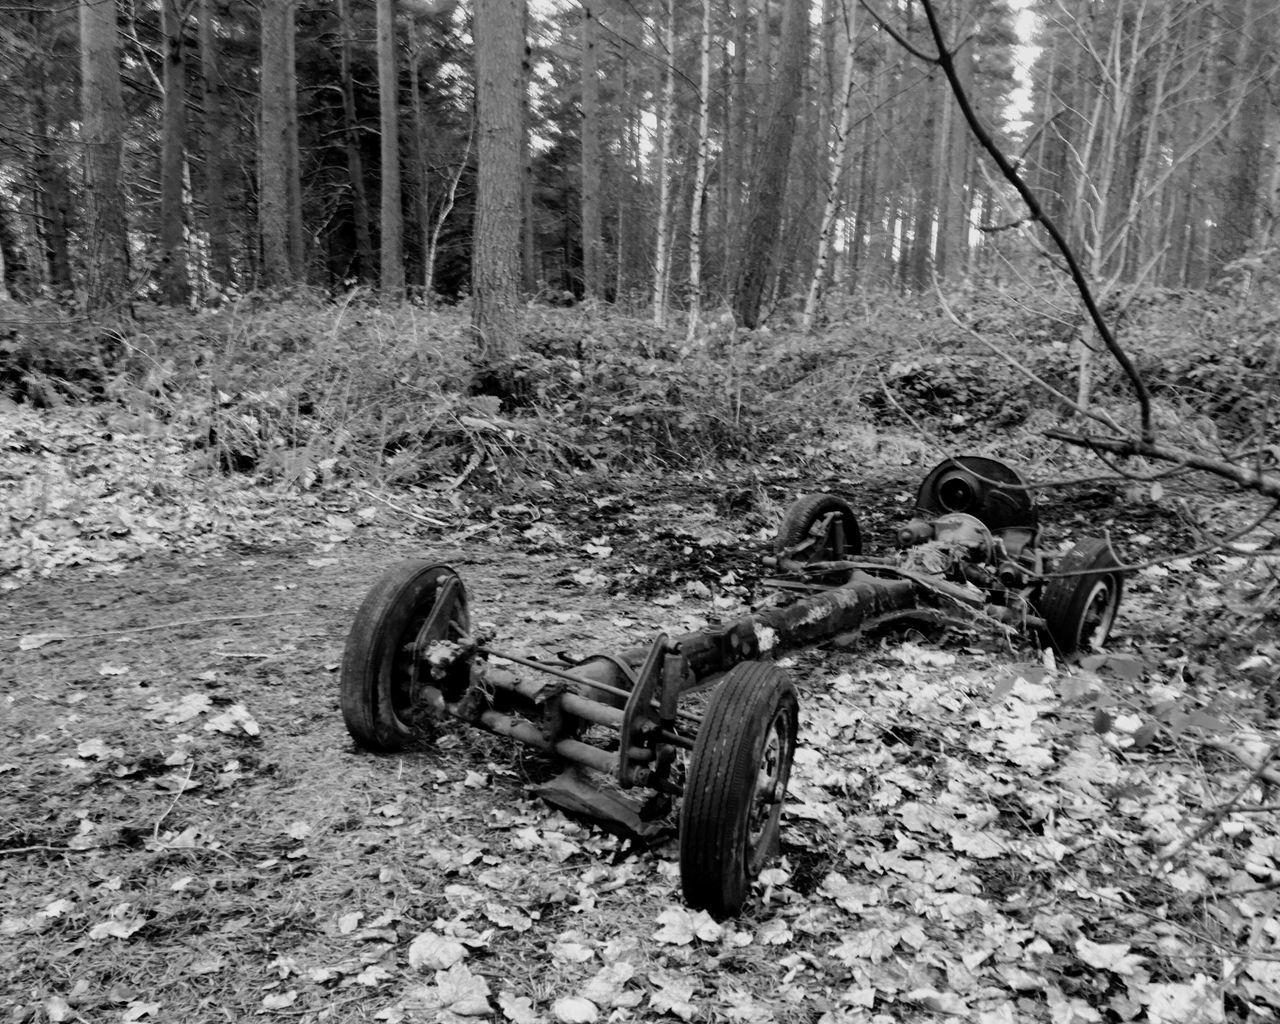 Car Volkswagen New Nature 3XSPUnity 3XSPUnity 3XSPhotographyUnity 3XSPhotographiUnity